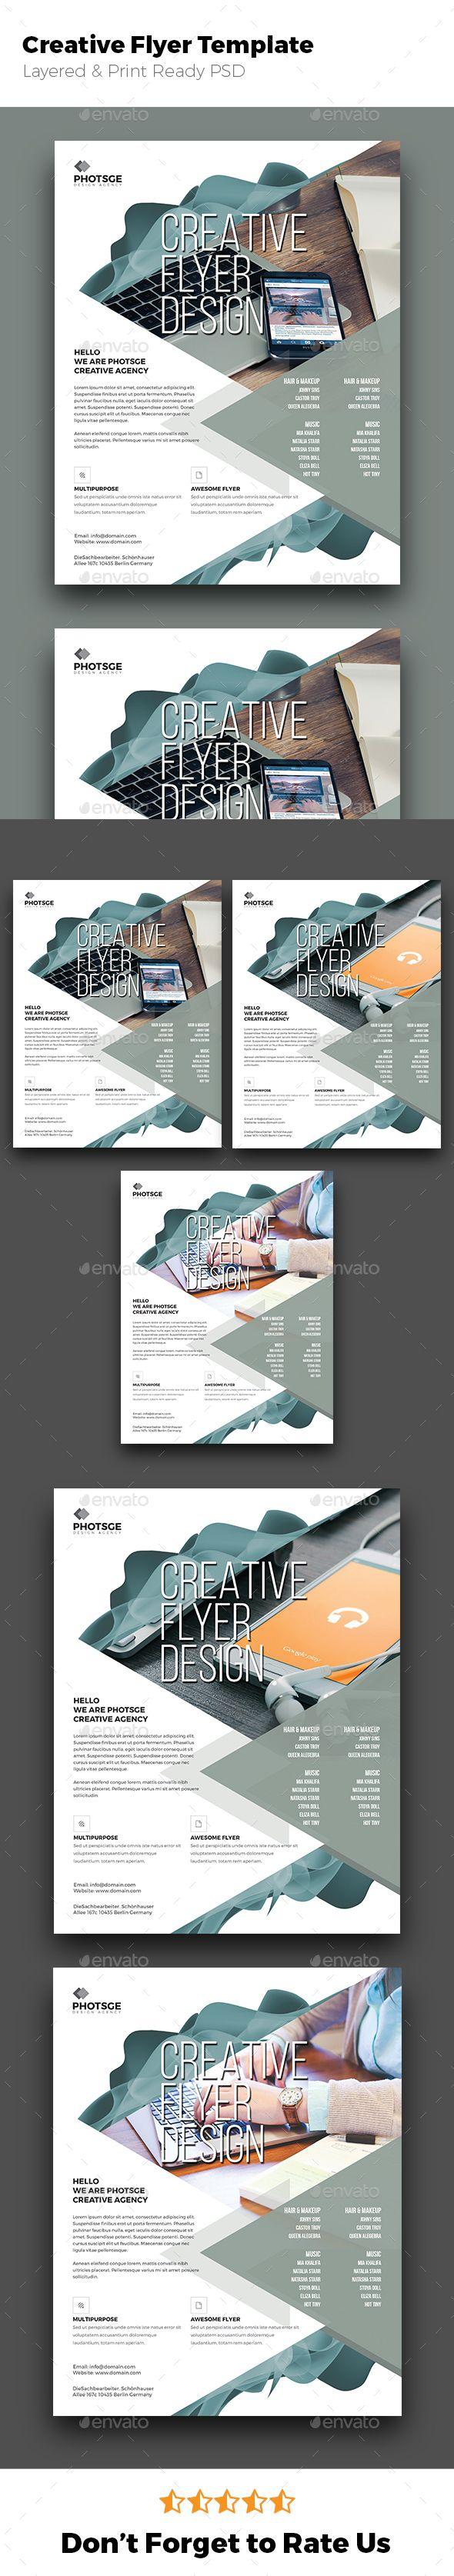 63 best Creative Flyers & Web Design Templates images on Pinterest